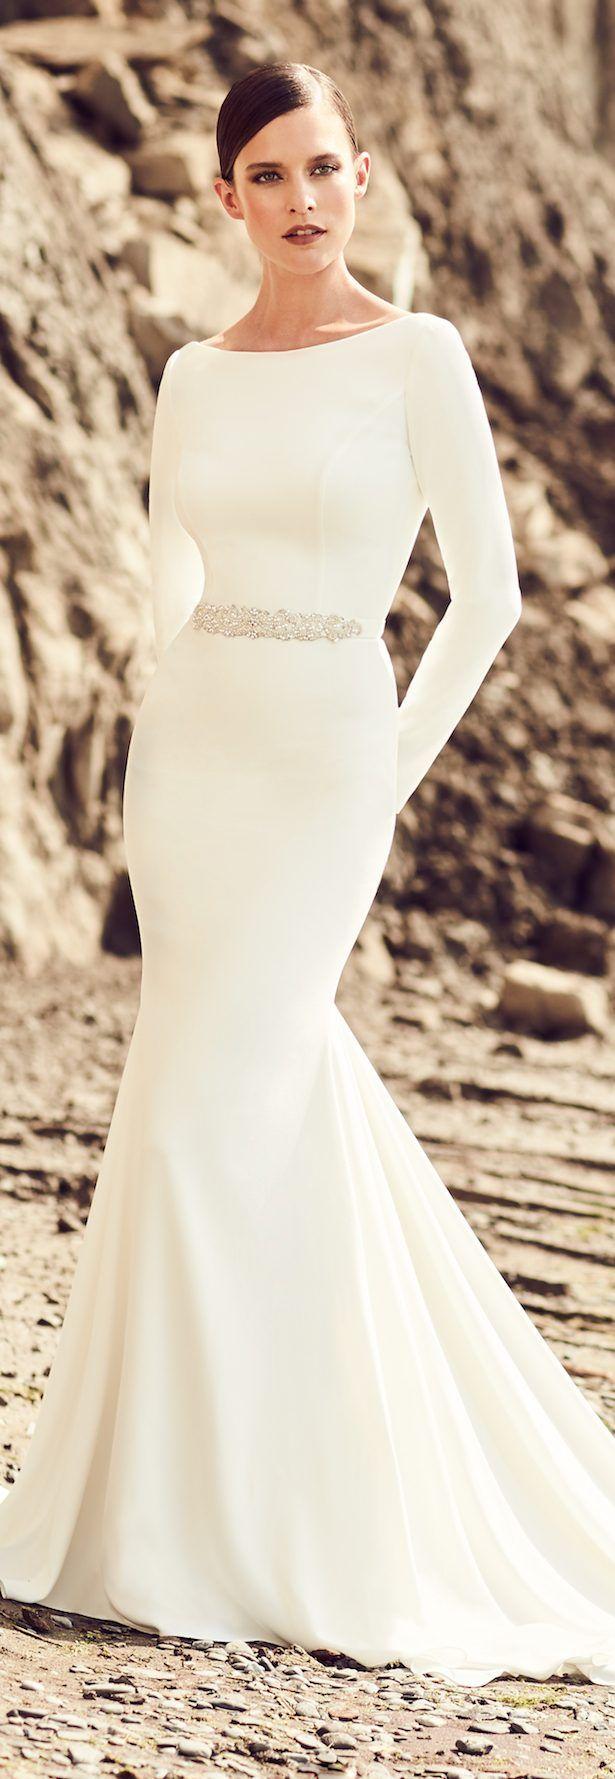 Classy Wedding Dresses – fashion dresses